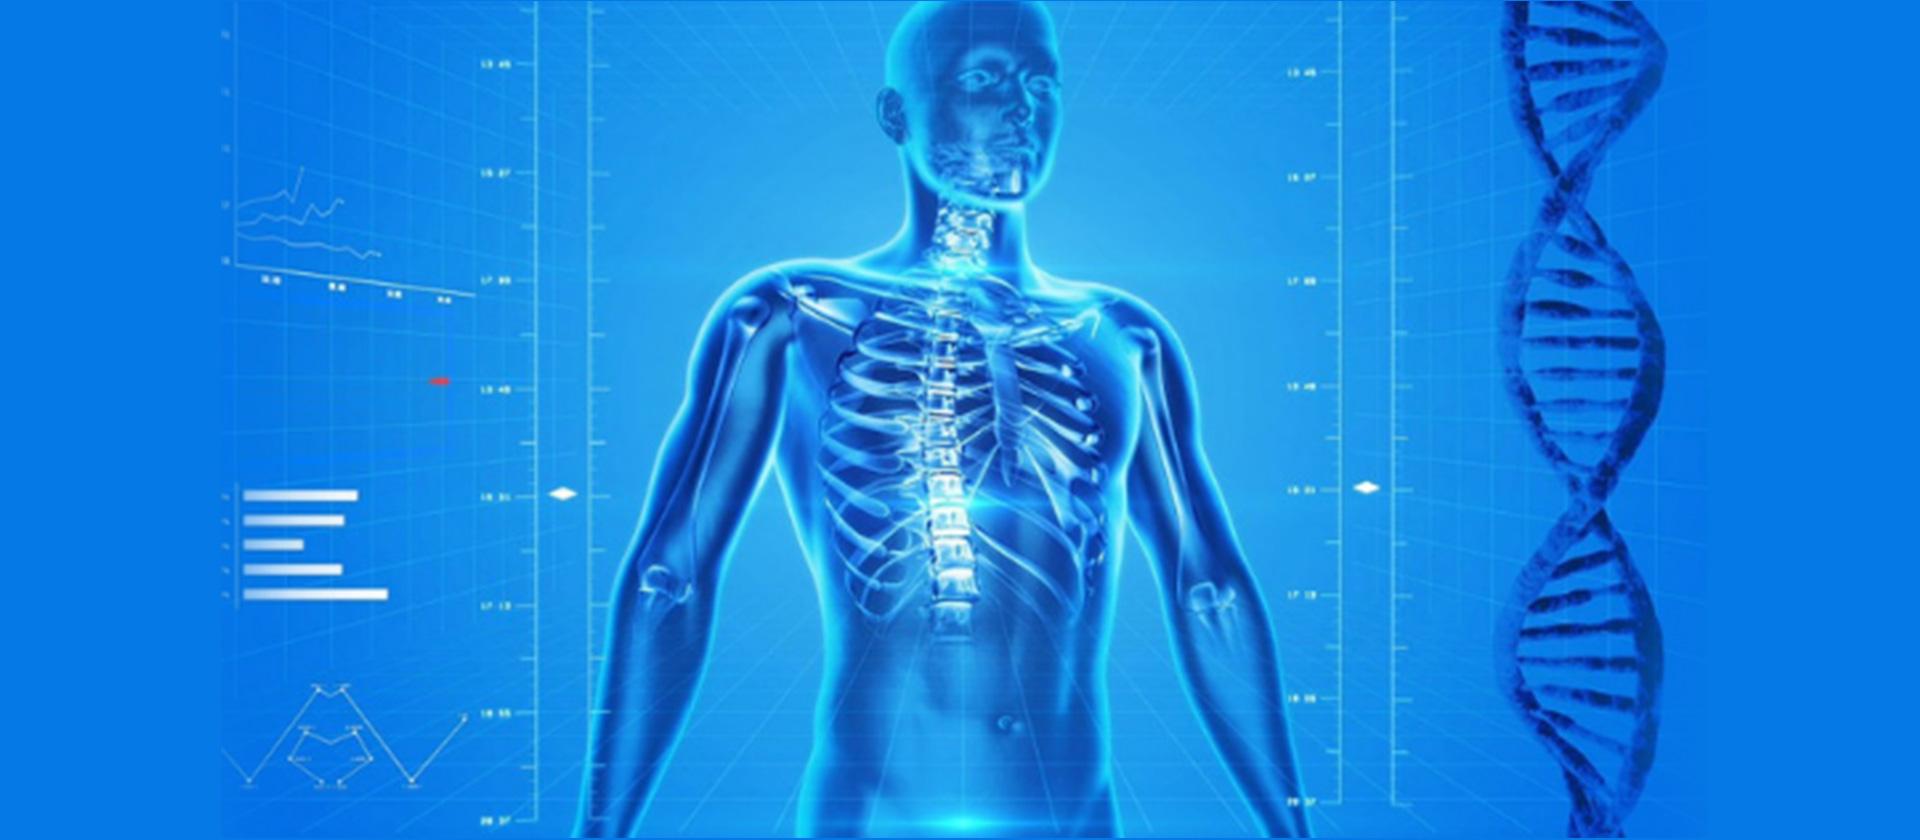 Human body DNA